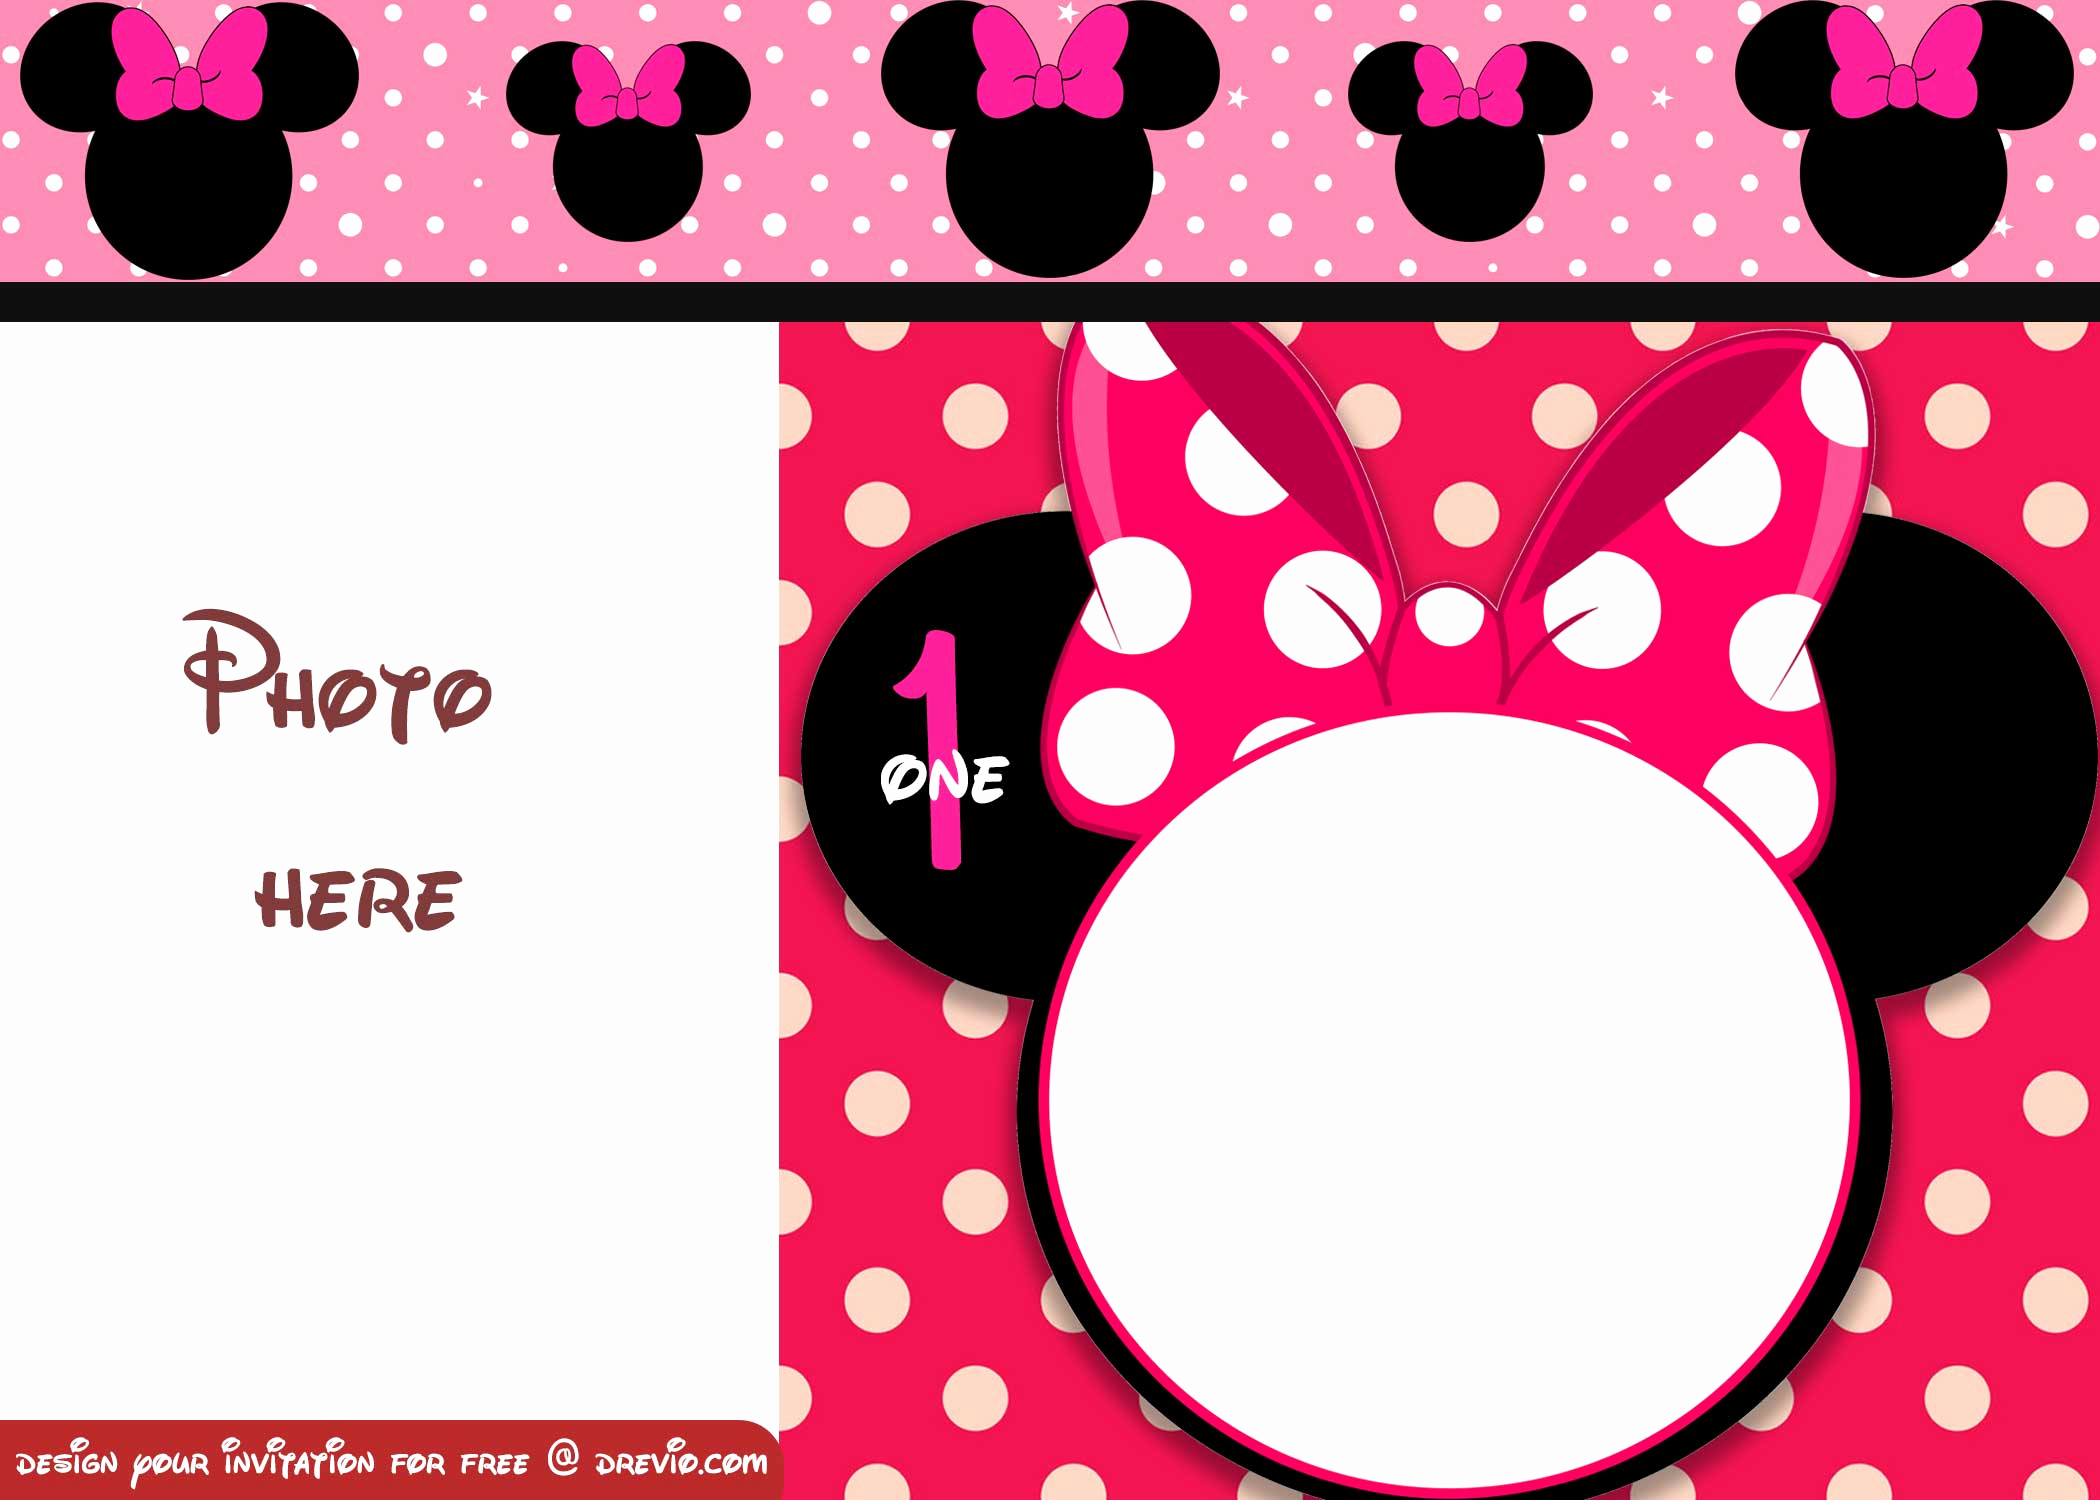 Minnie Mouse Invitation Template Free New Free Minnie Mouse Polka Dot 1st Birthday Invitation